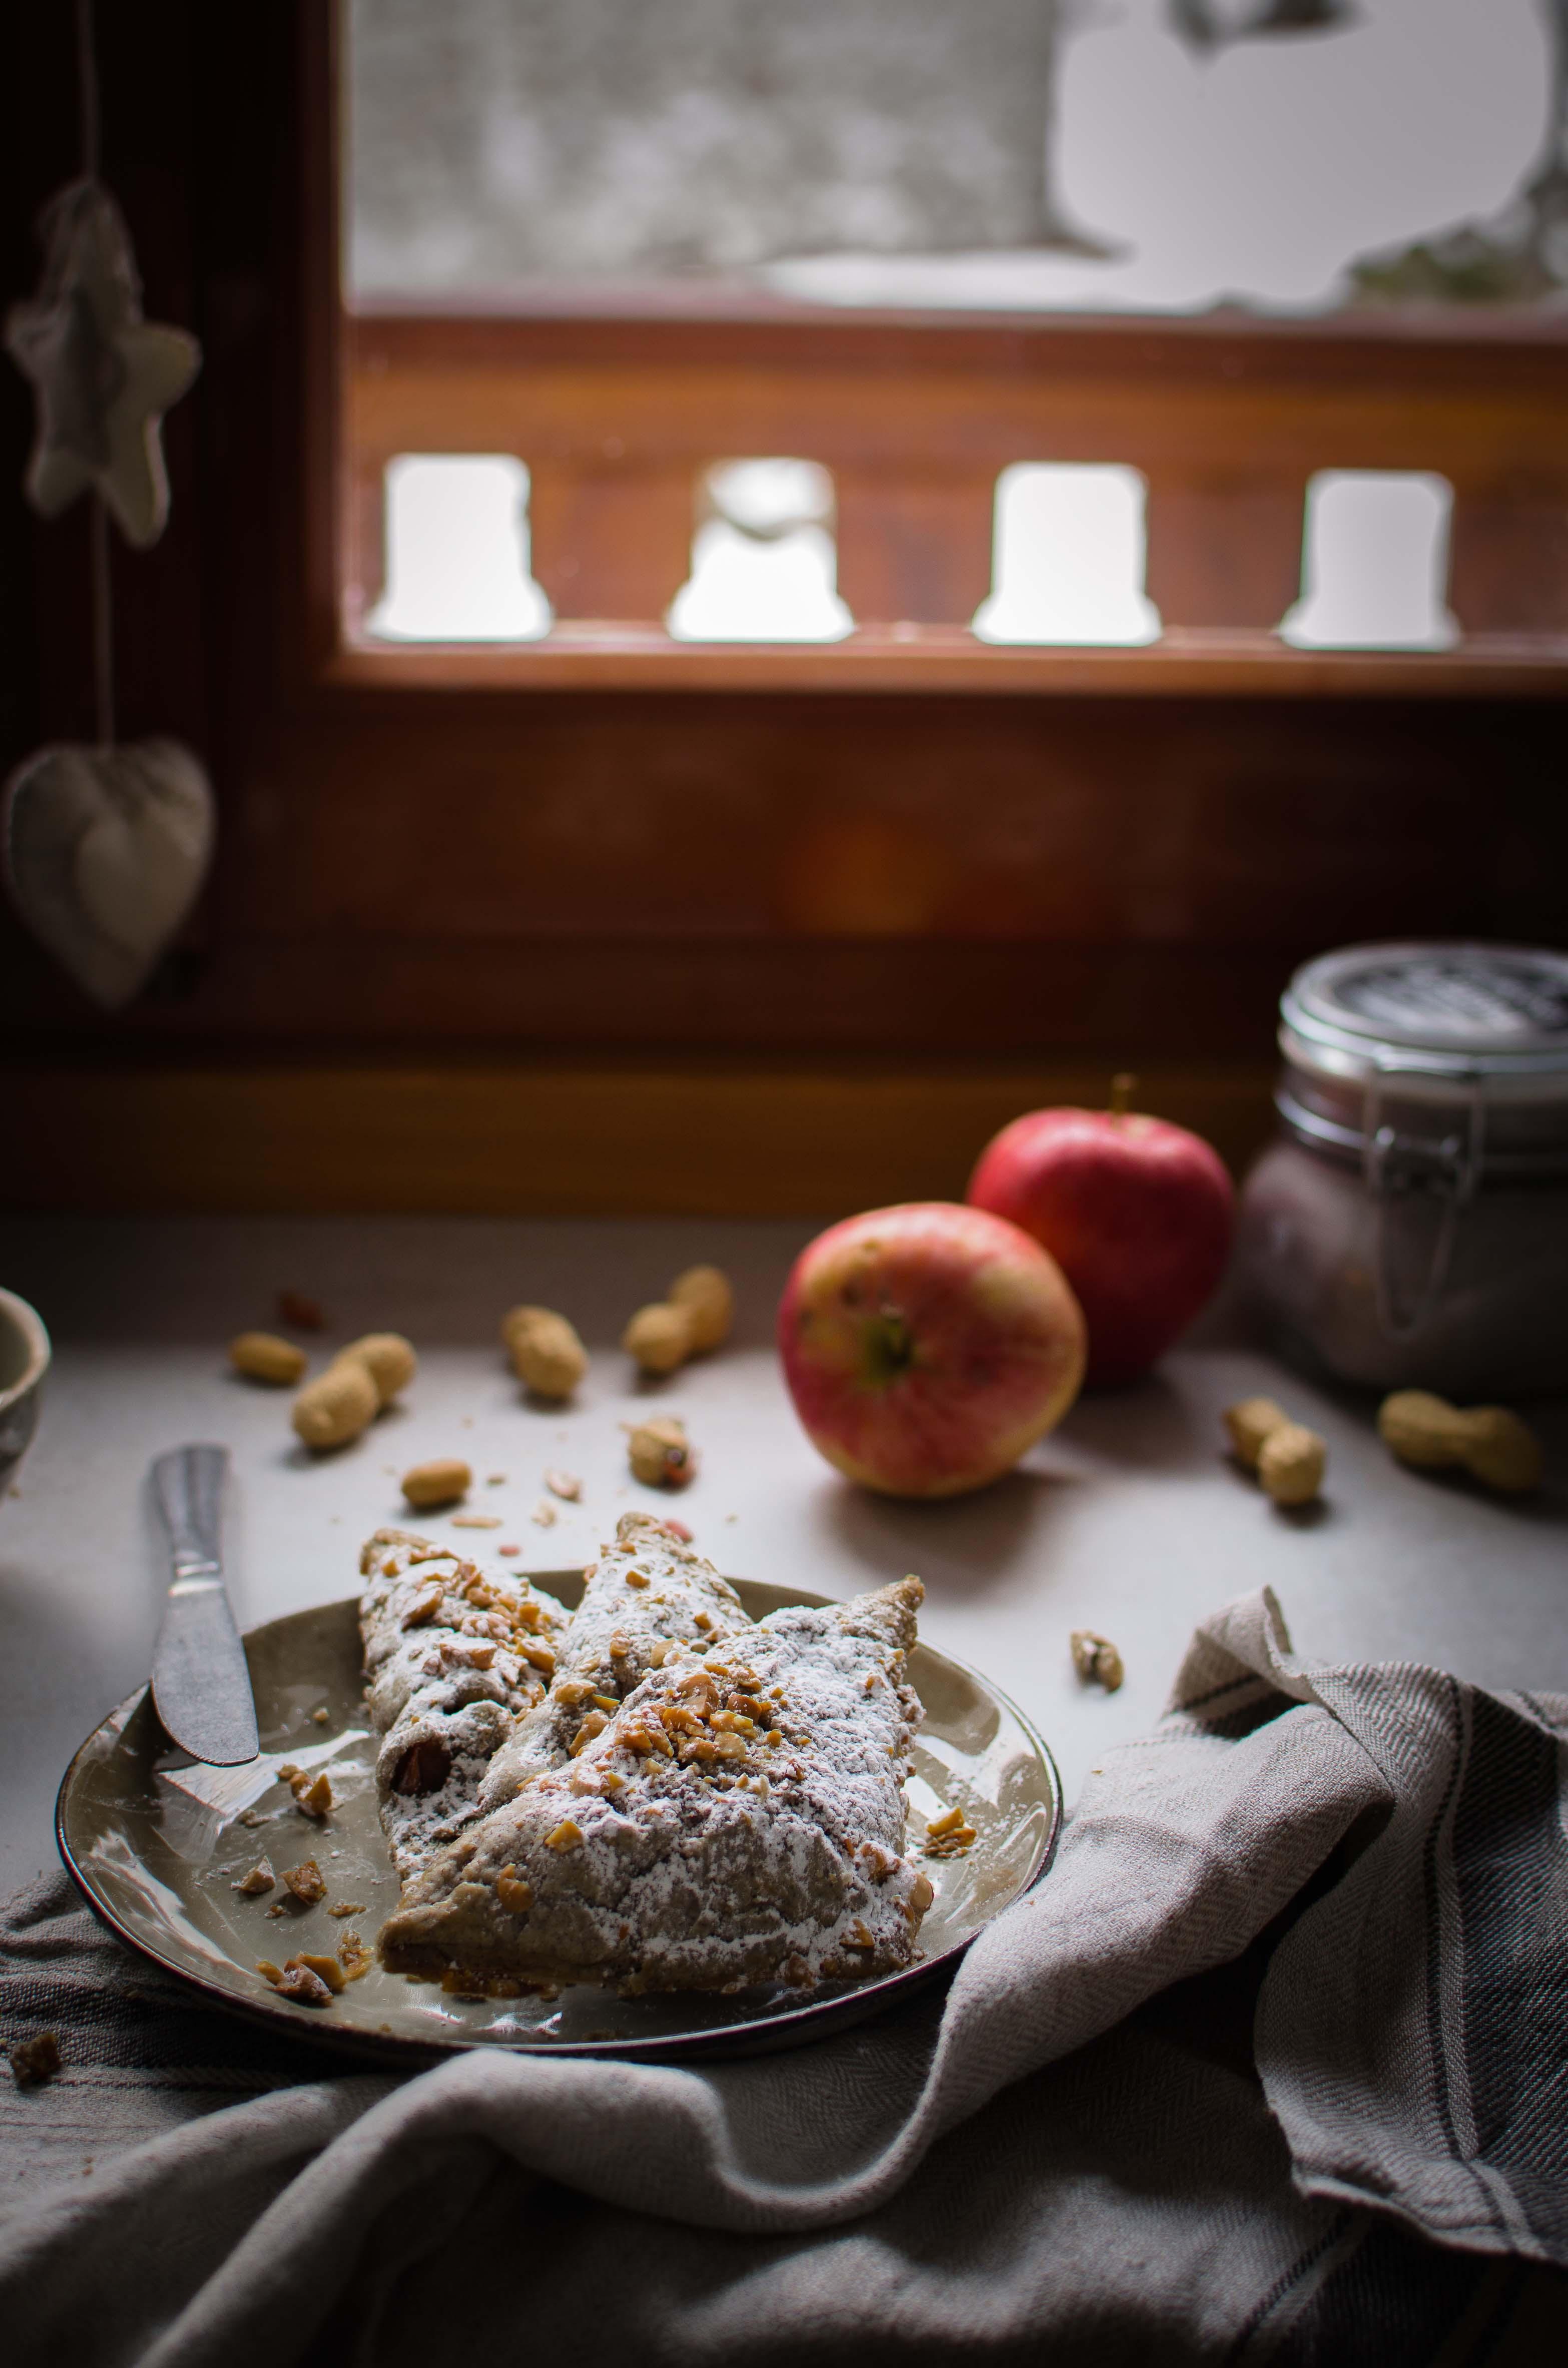 mele-ricotta-uvetta-arachidi Turnovers mele, arachidi, cannella e ricotta di capra